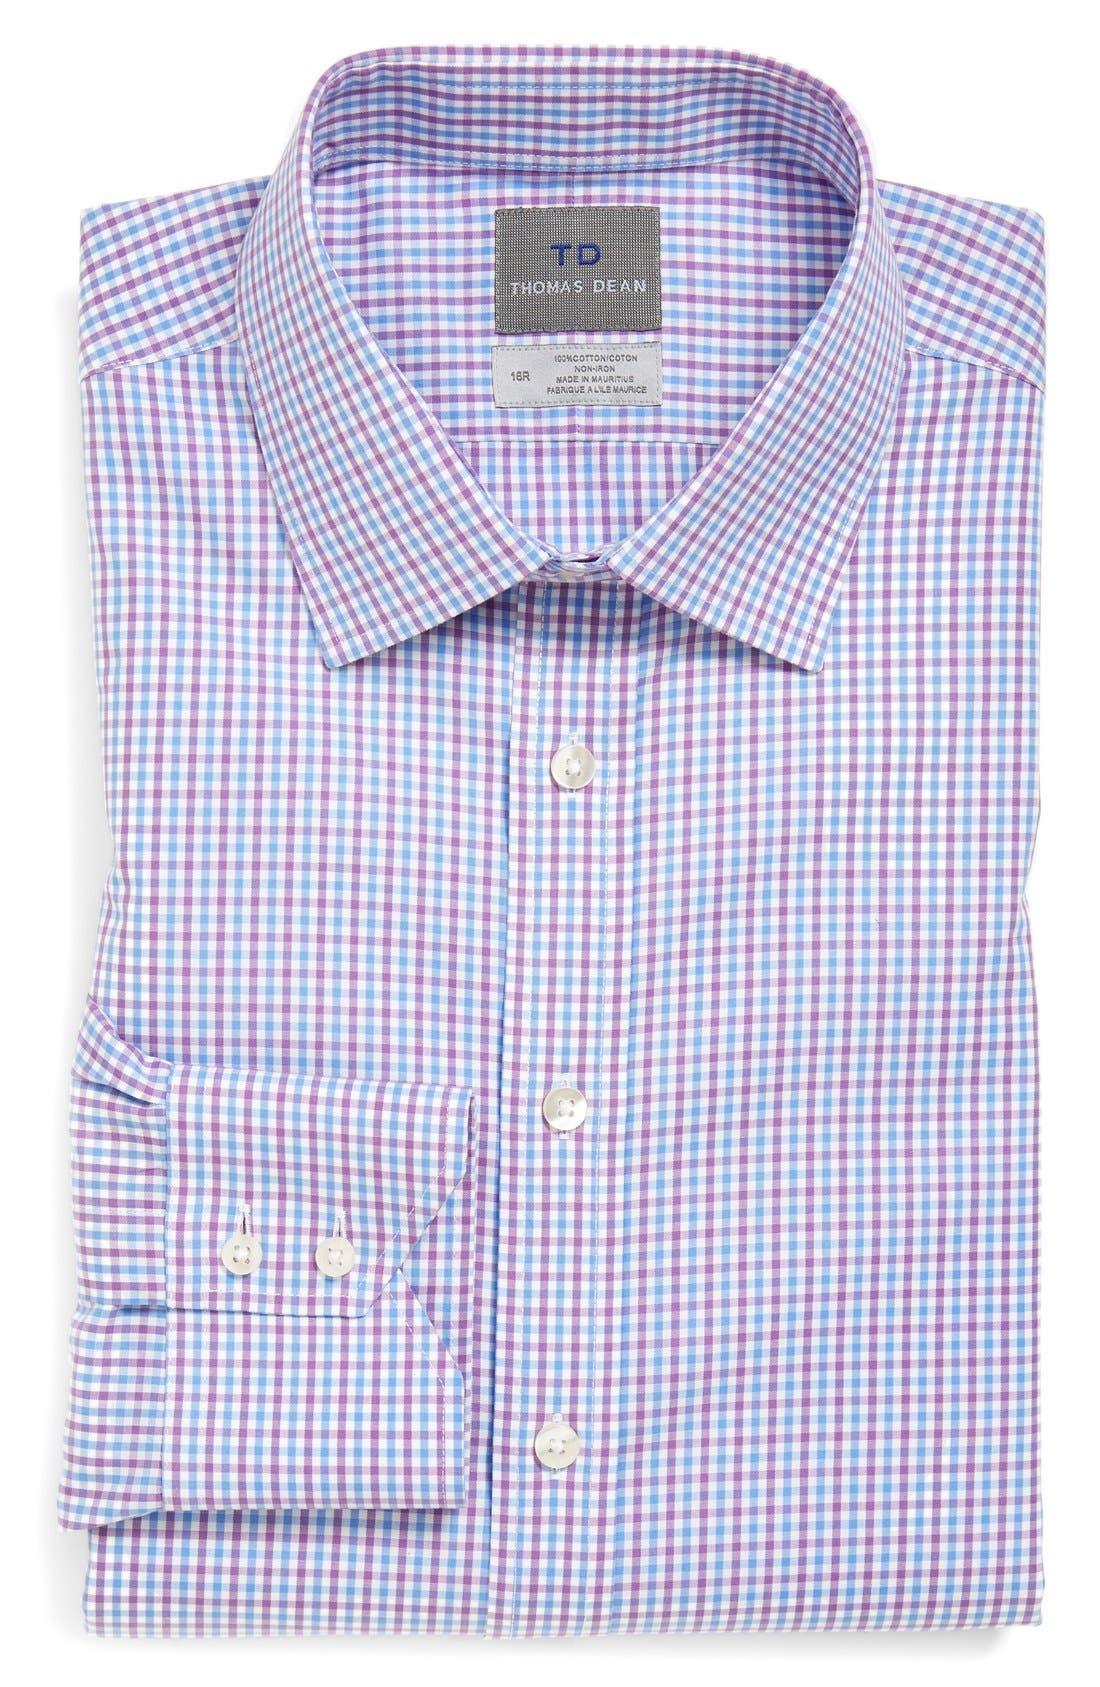 Main Image - Thomas Dean Regular Fit Non-Iron Check Dress Shirt